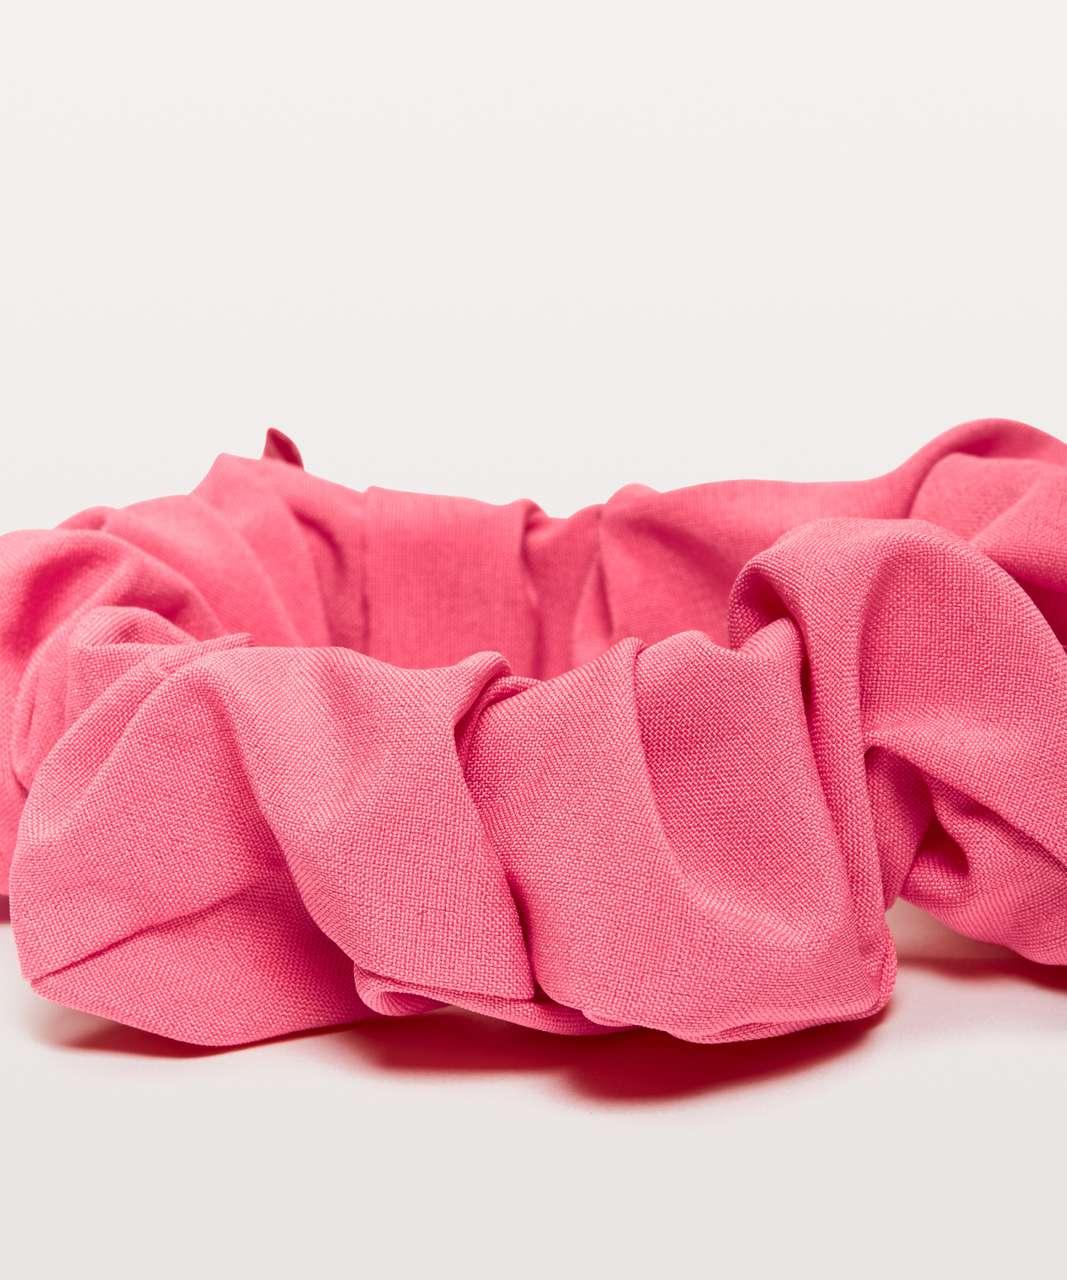 Lululemon Uplifting Scrunchie - Glossy